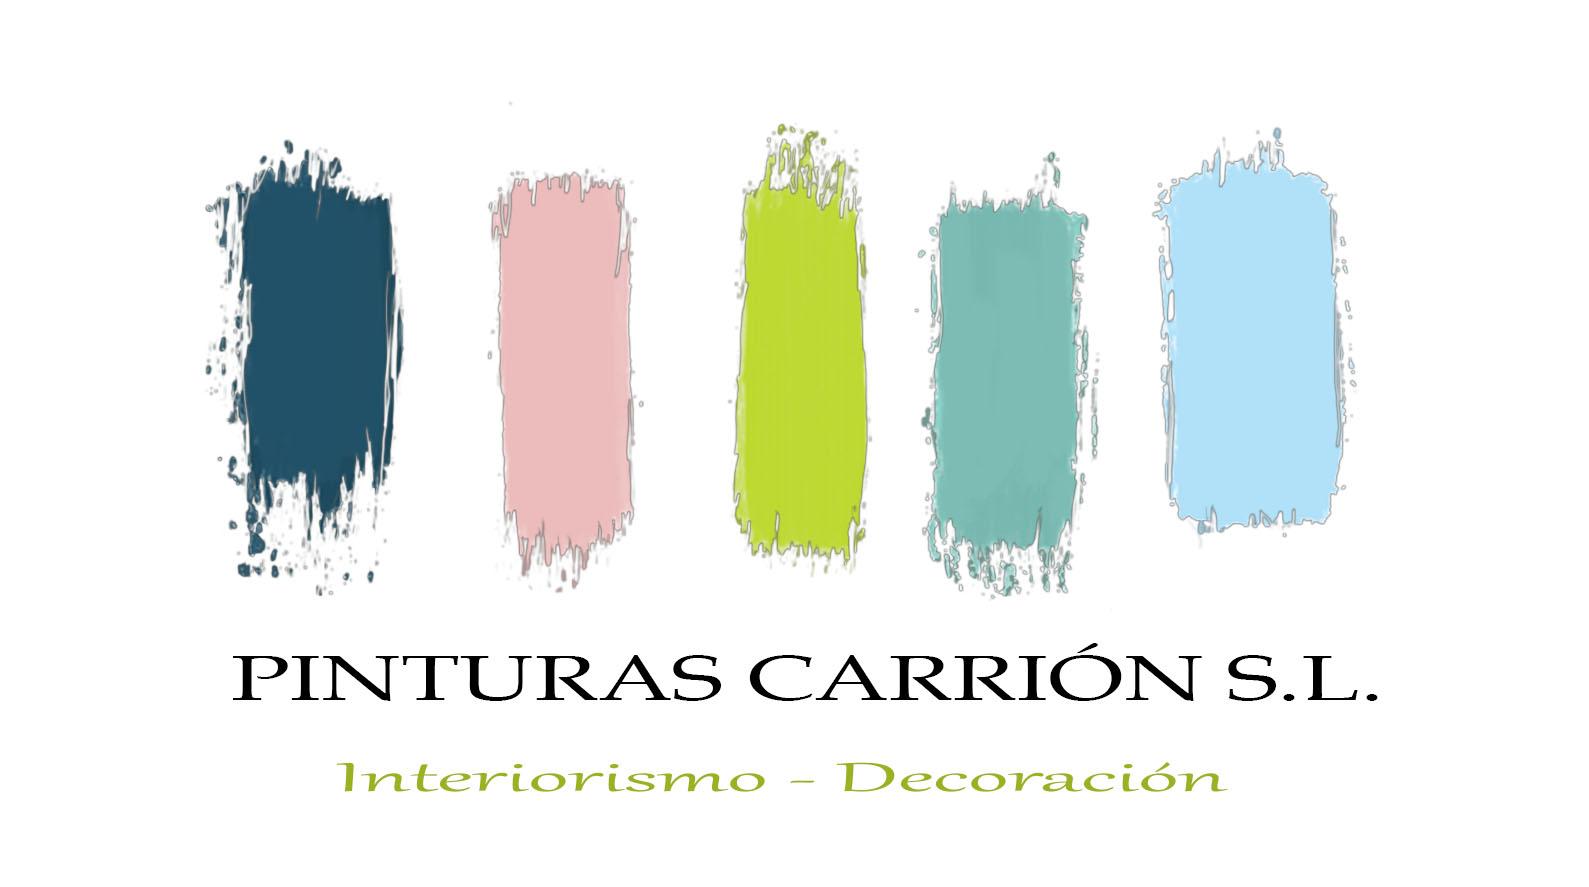 Pinturas Carrion.sl